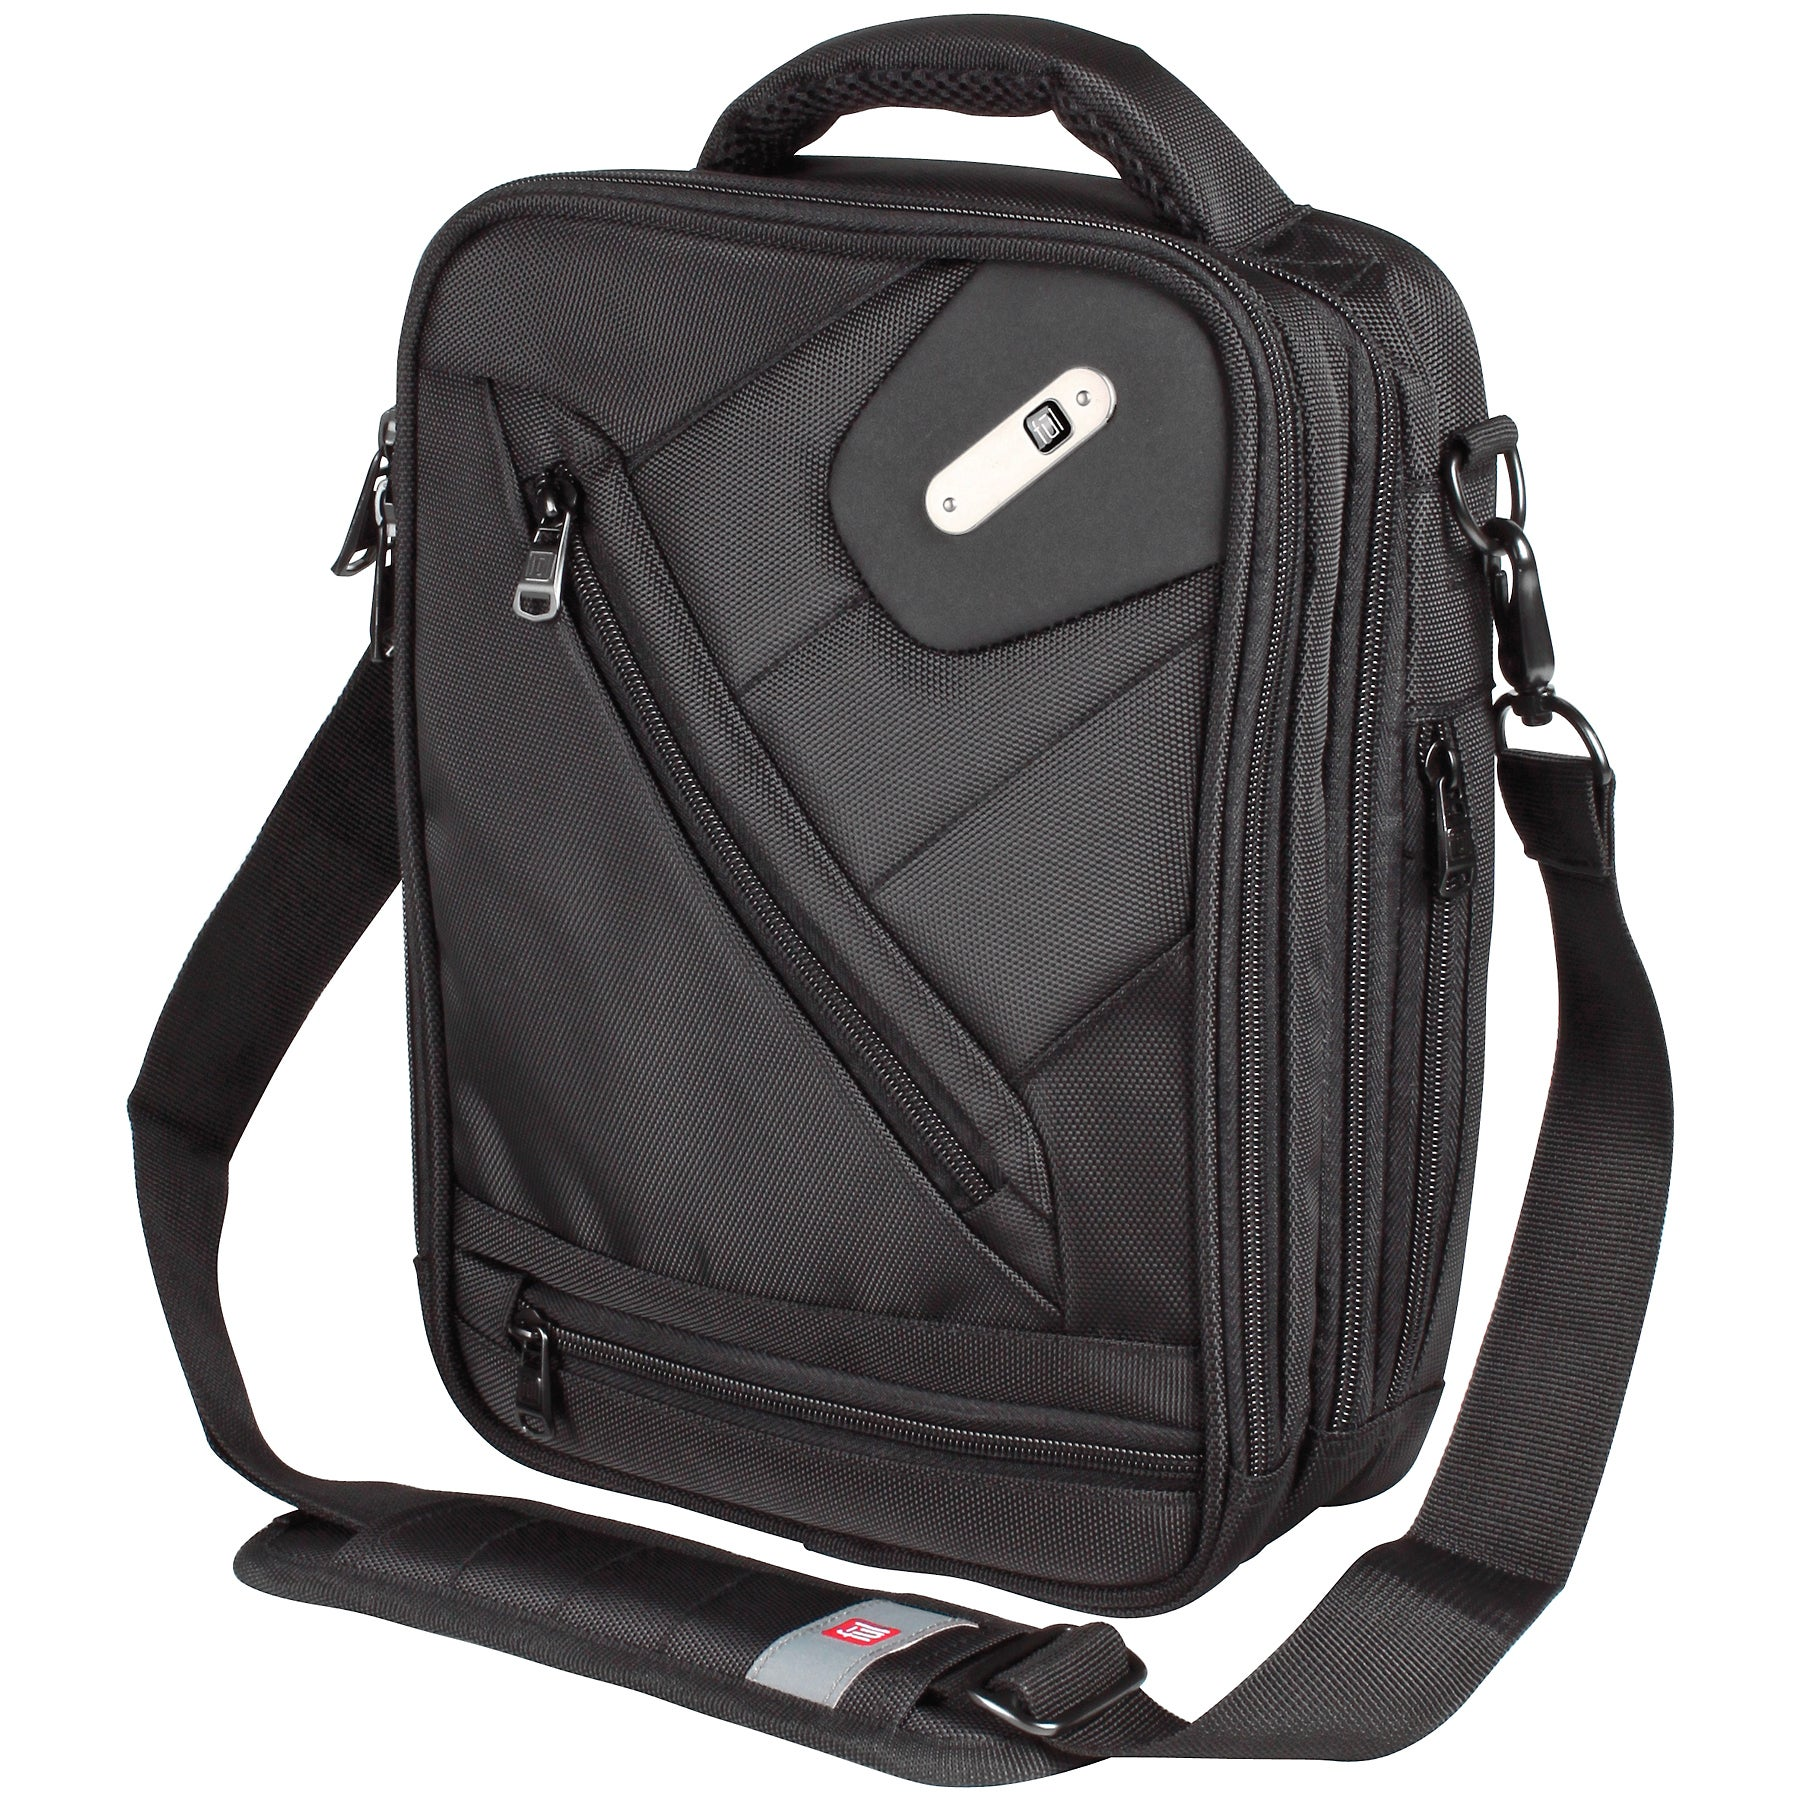 Shop Ful Sidecar Black Vertical Messenger Bag - Free Shipping On ...